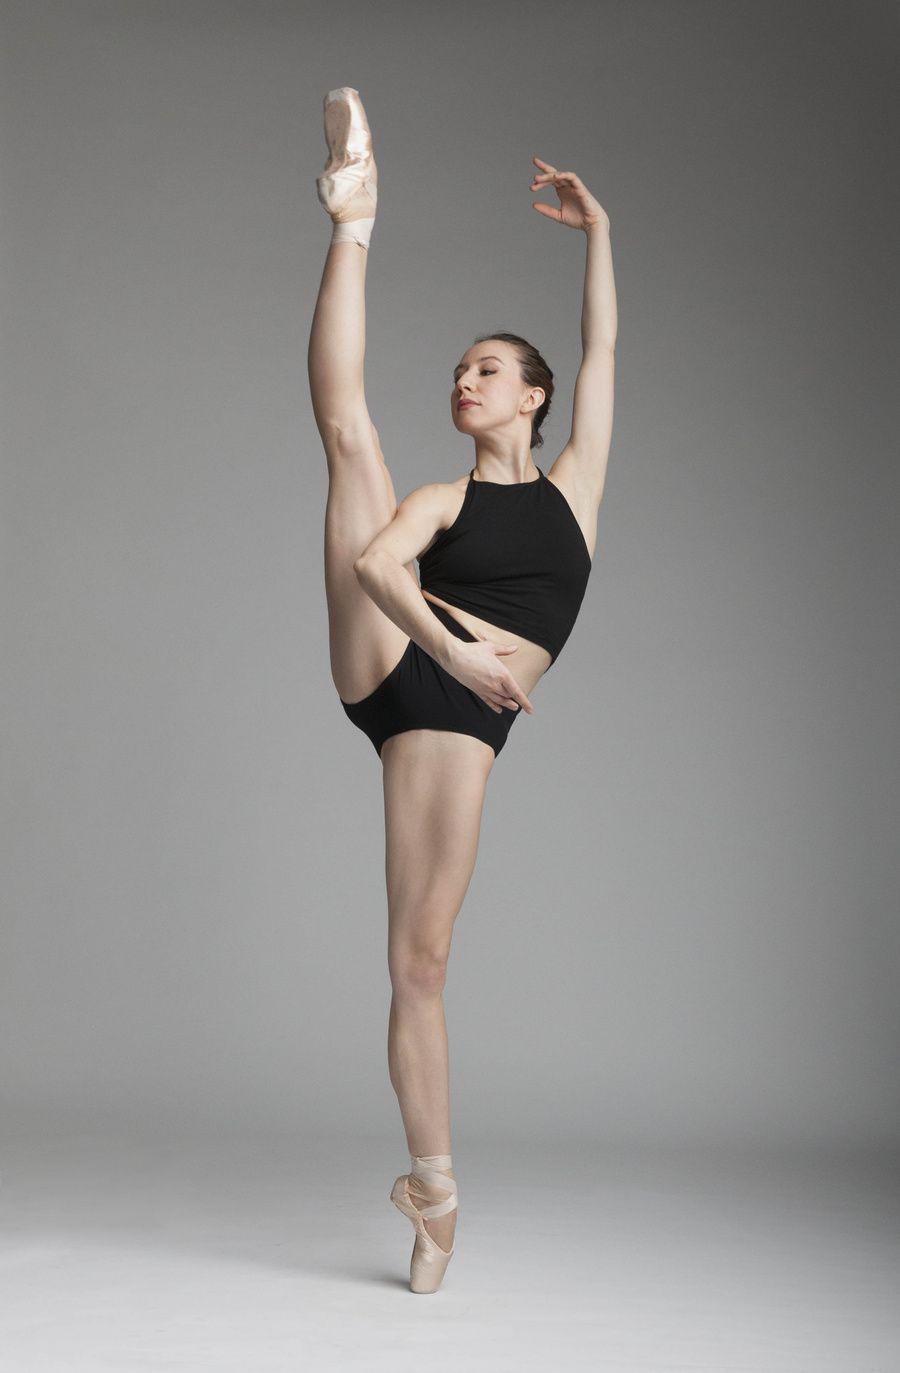 Pictures Isabella Boylston naked (83 photos), Ass, Is a cute, Feet, butt 2015